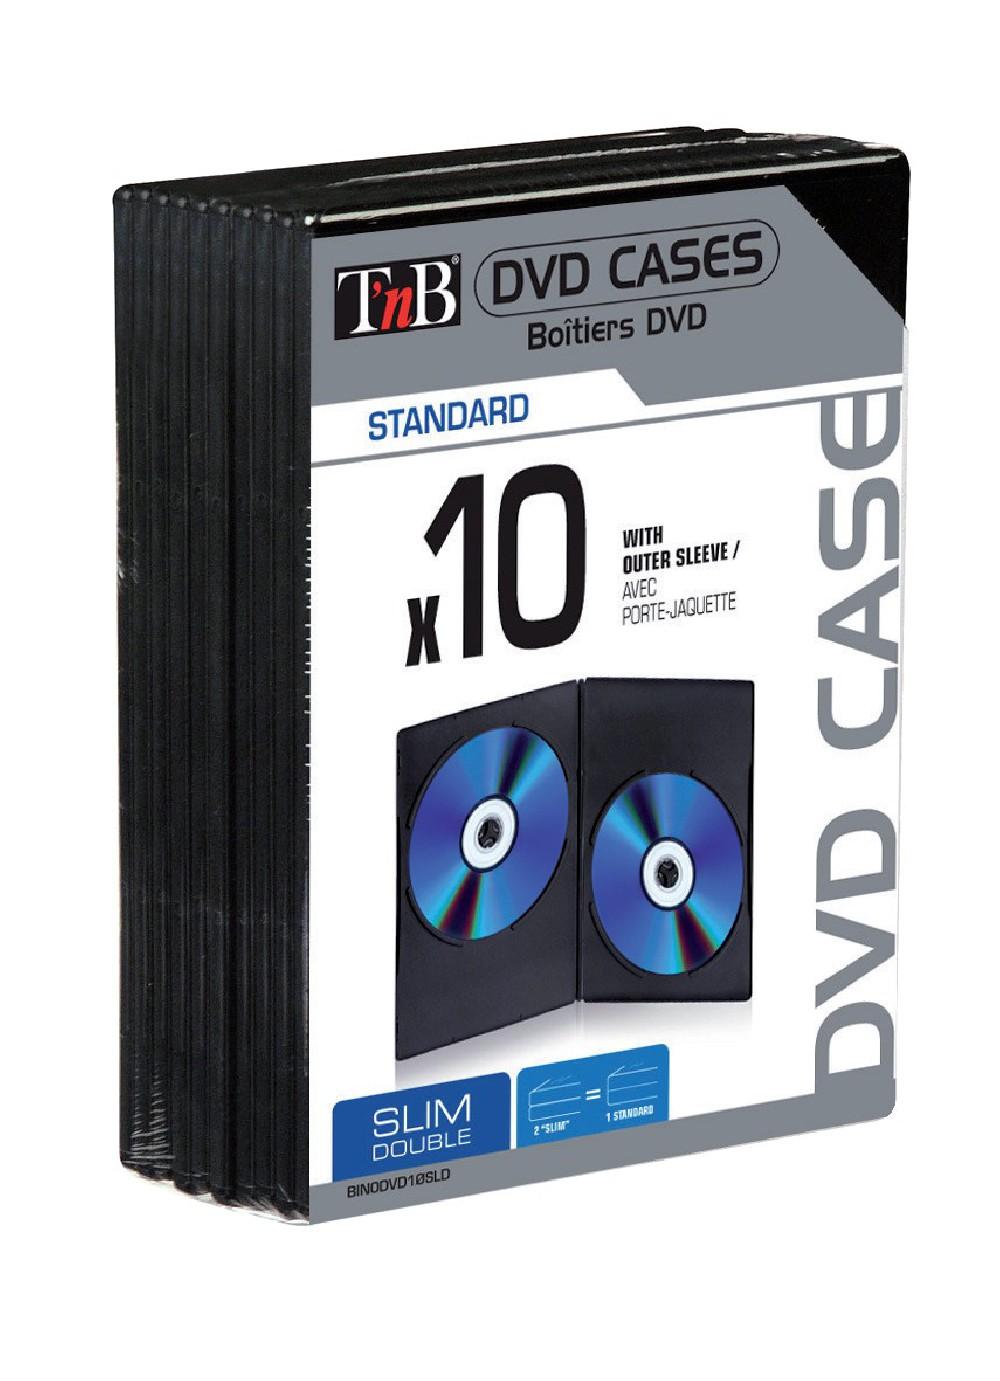 BOITIER DVD SLIM DOUBLE X10